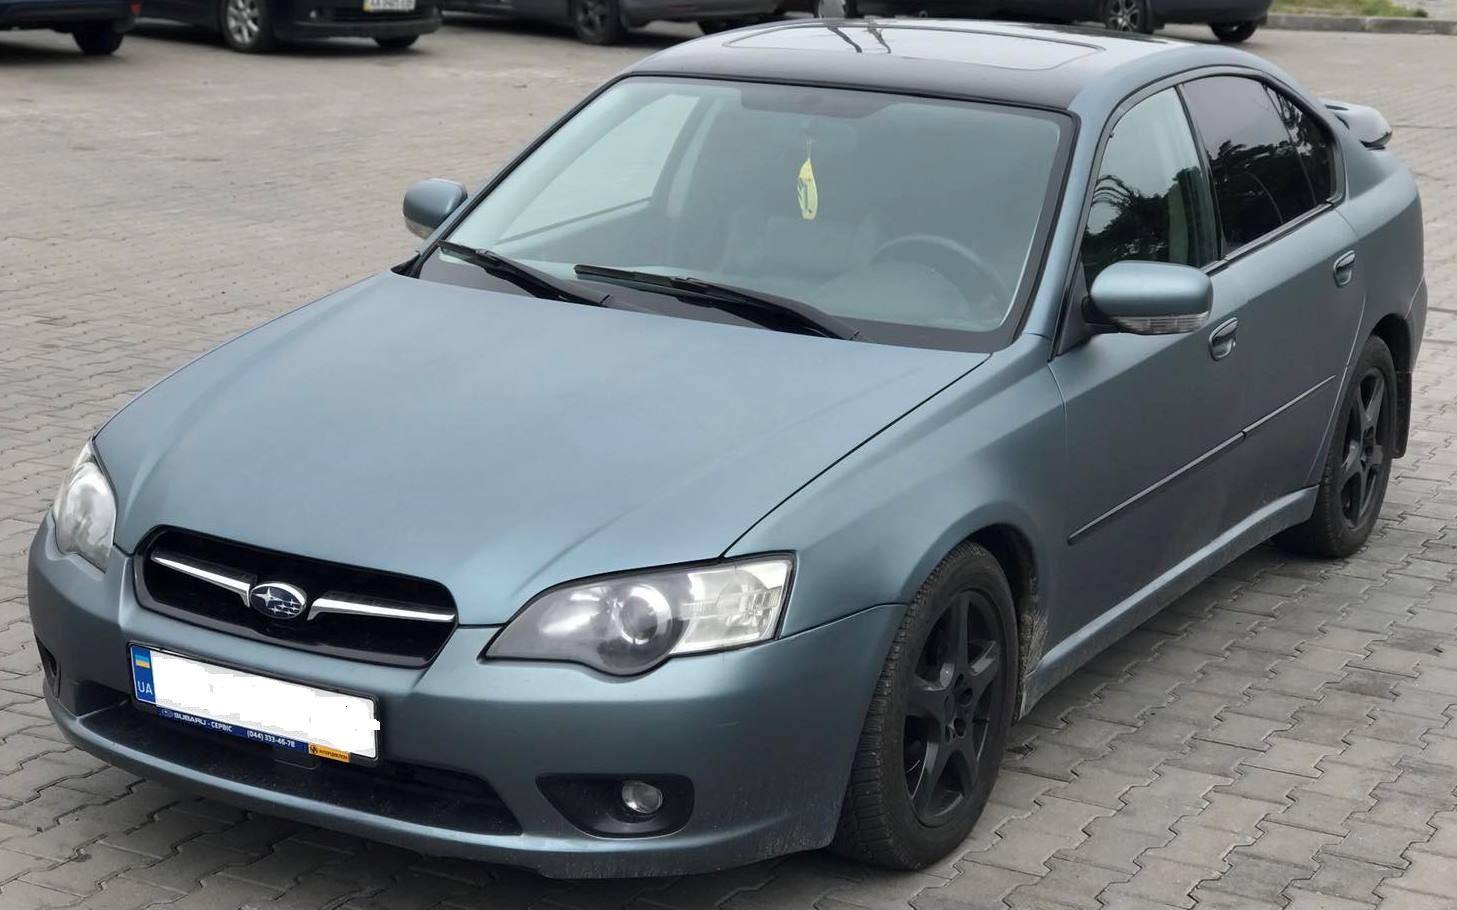 Аренда авто под выкуп Субару Легаси Киев без залога недорого